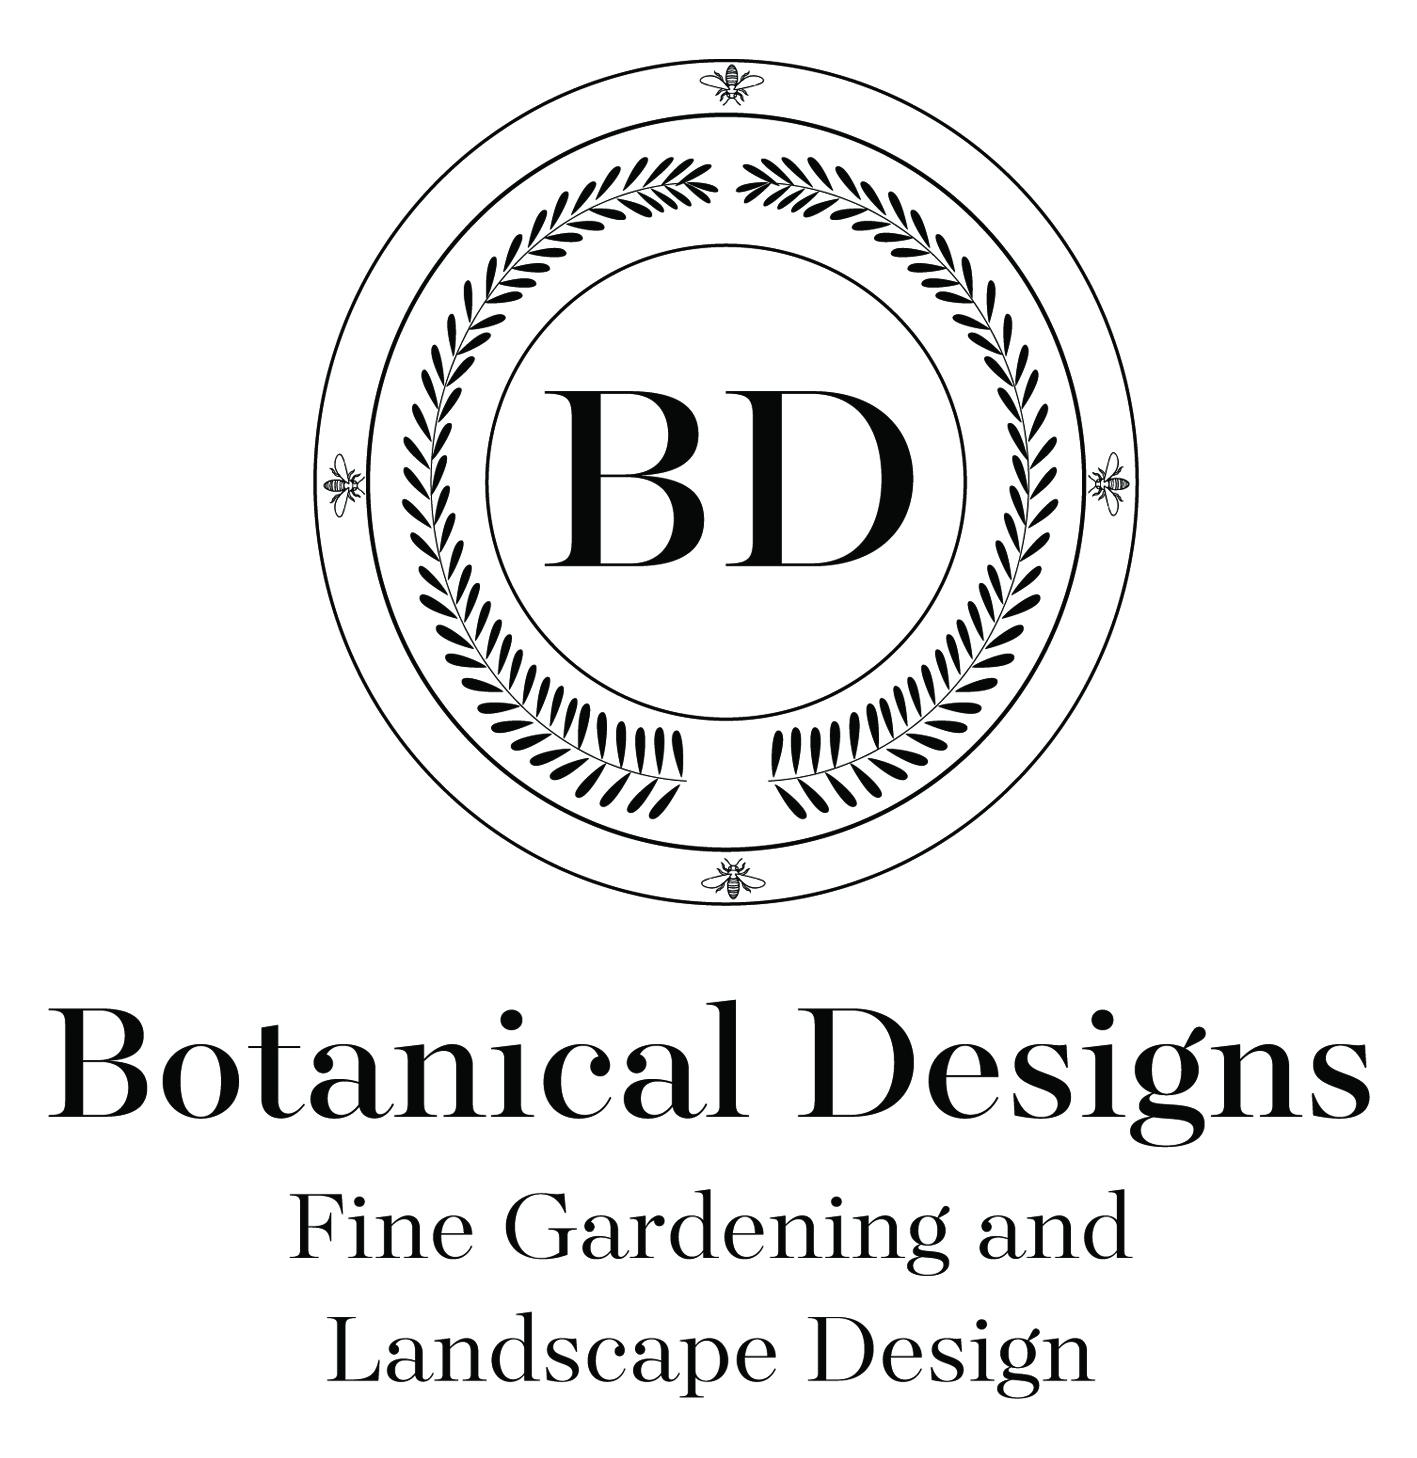 botanical final 2.jpg